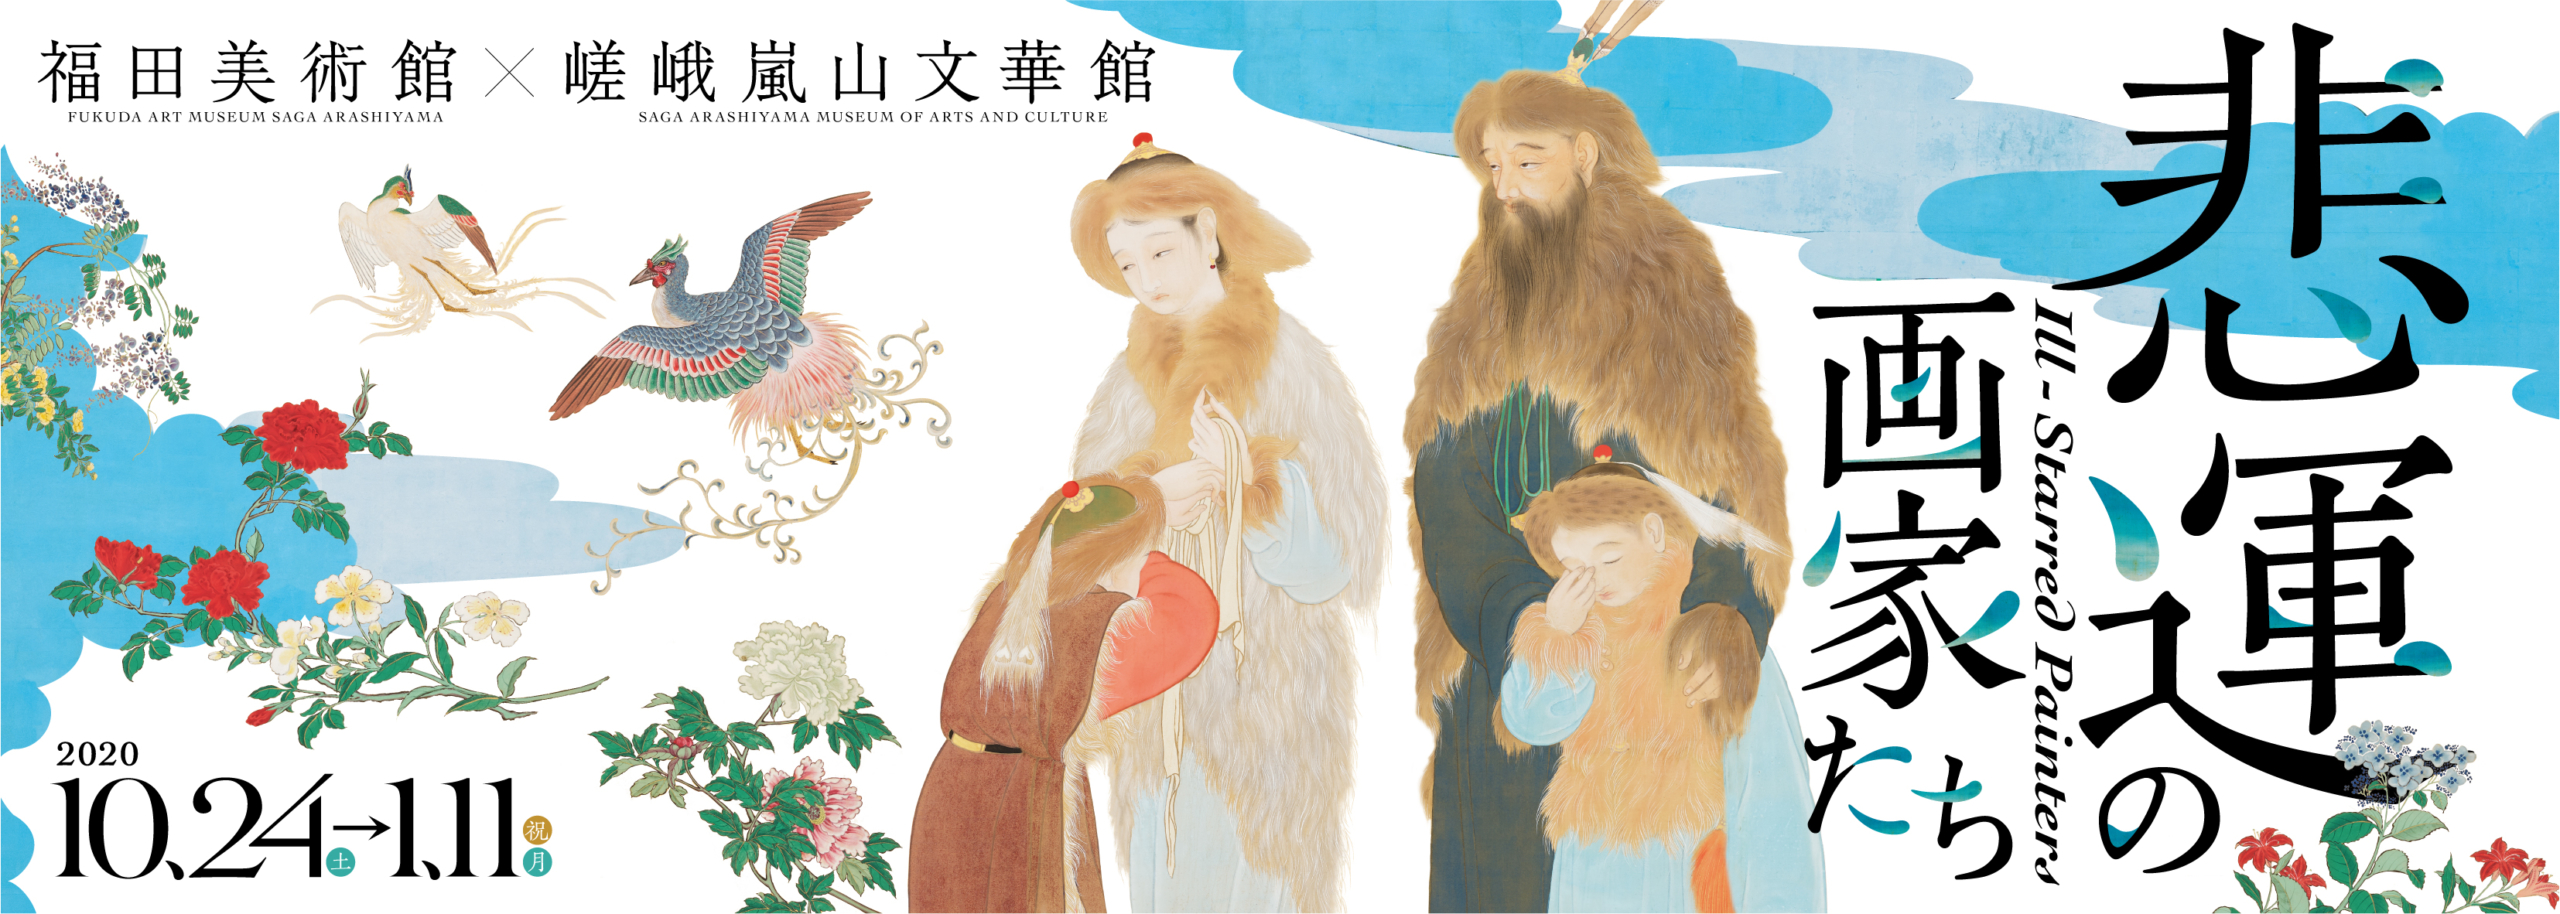 hiunnogaka_HP_Banner_0805-02-scaled